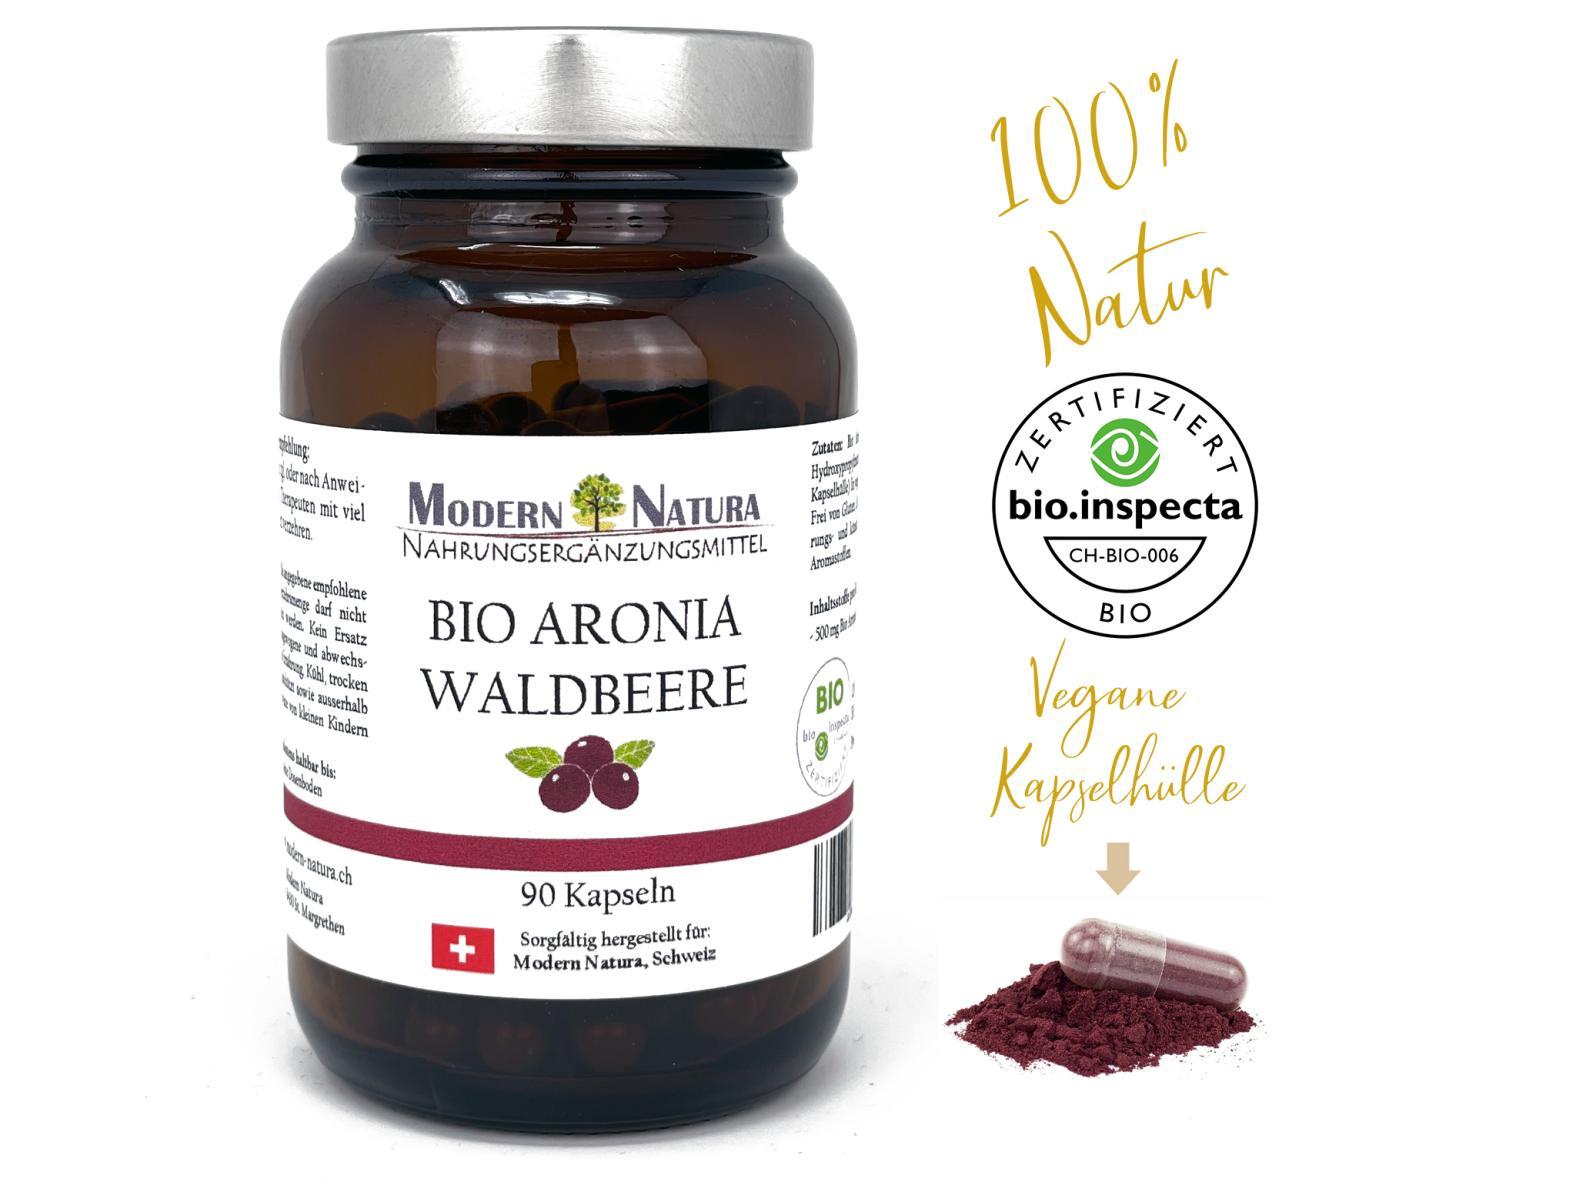 BIO Aronia Waldbeere - 90 Kapseln - Vegan & Glutenfrei - 500mg reinstes Aroniabeeren Pulver / Apfelbeere